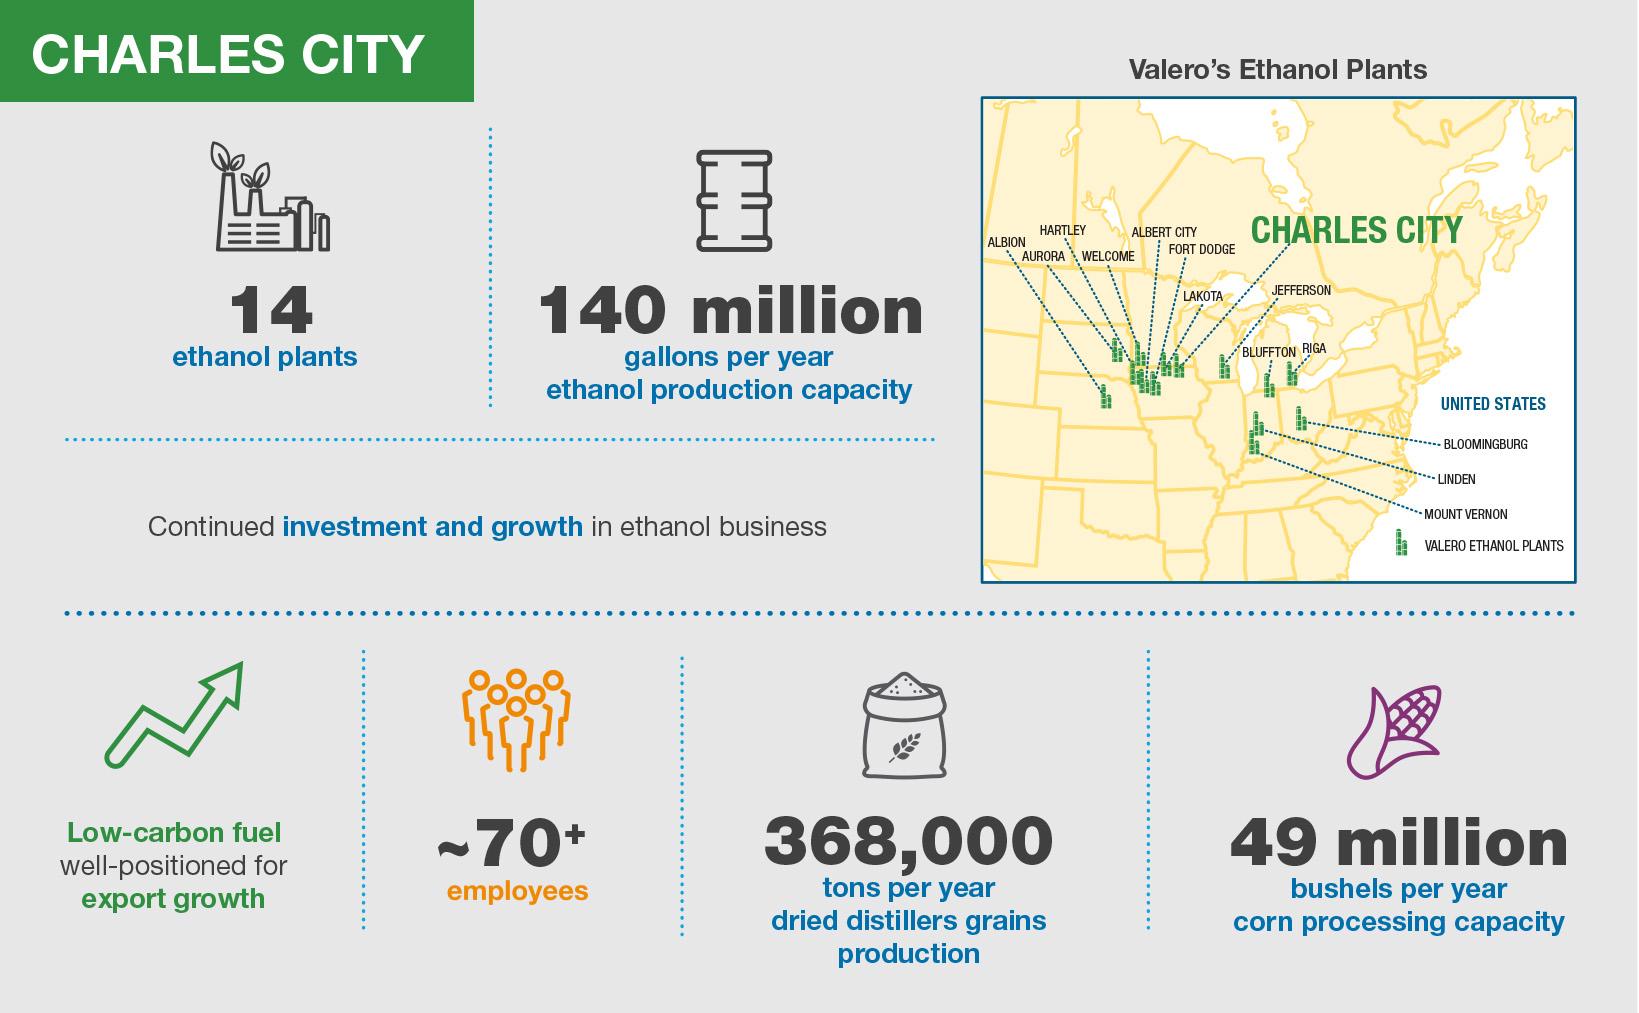 Valero Charles City Ethanol Plant Infographic